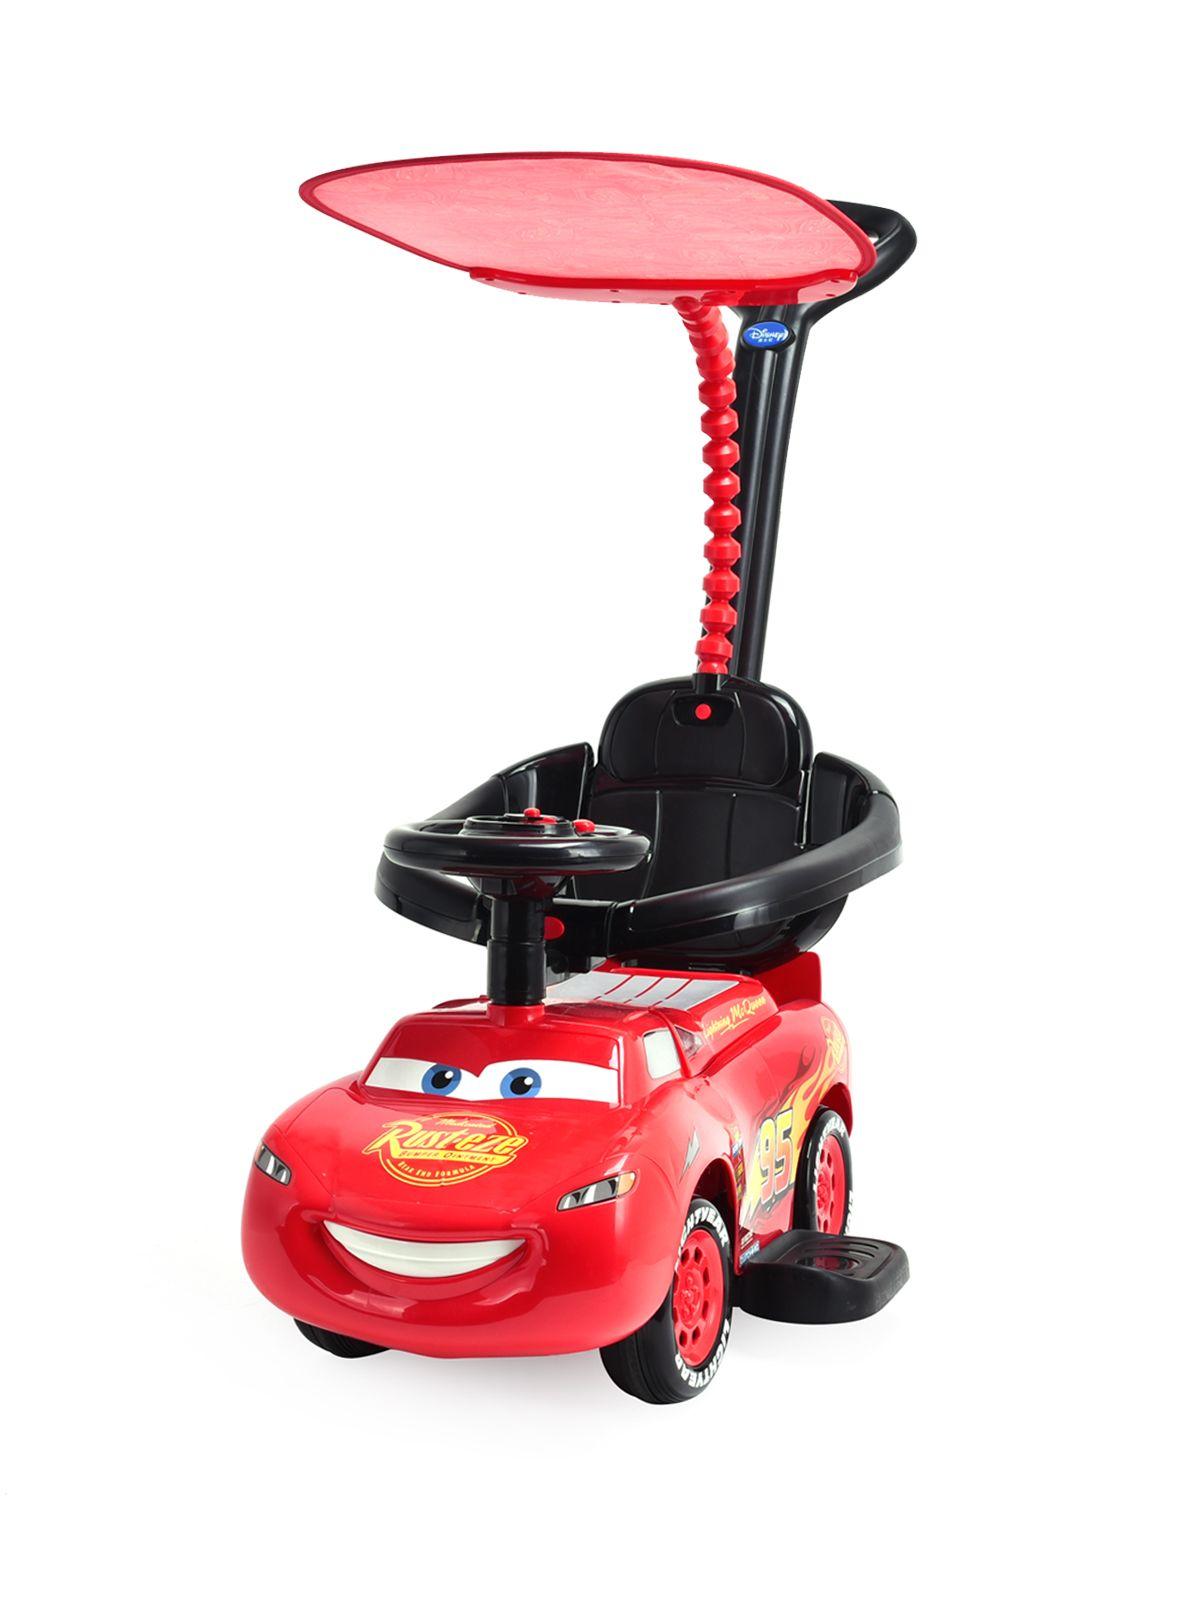 McQueen push on stroller Car sit, Baby car, Car